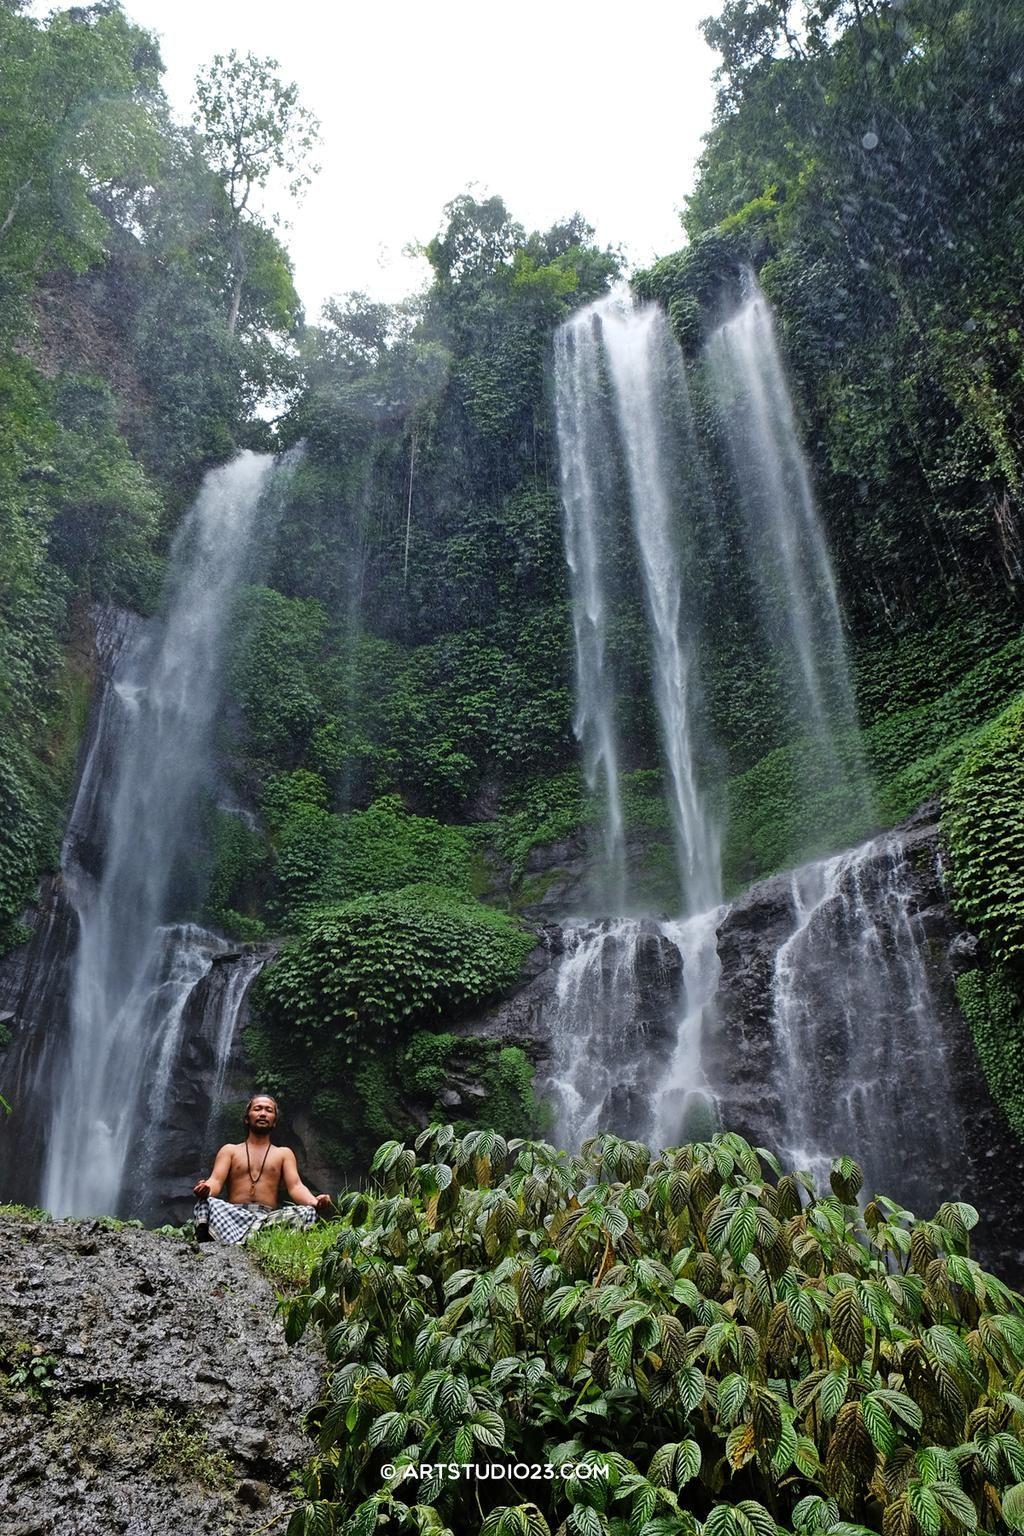 .@FujifilmXLive writing a book about my travels with #XT1 as we speak... @FujifilmEU #mindfulness #contemplative trip #bali #sekumpul waterfalls www.omunitybali.com